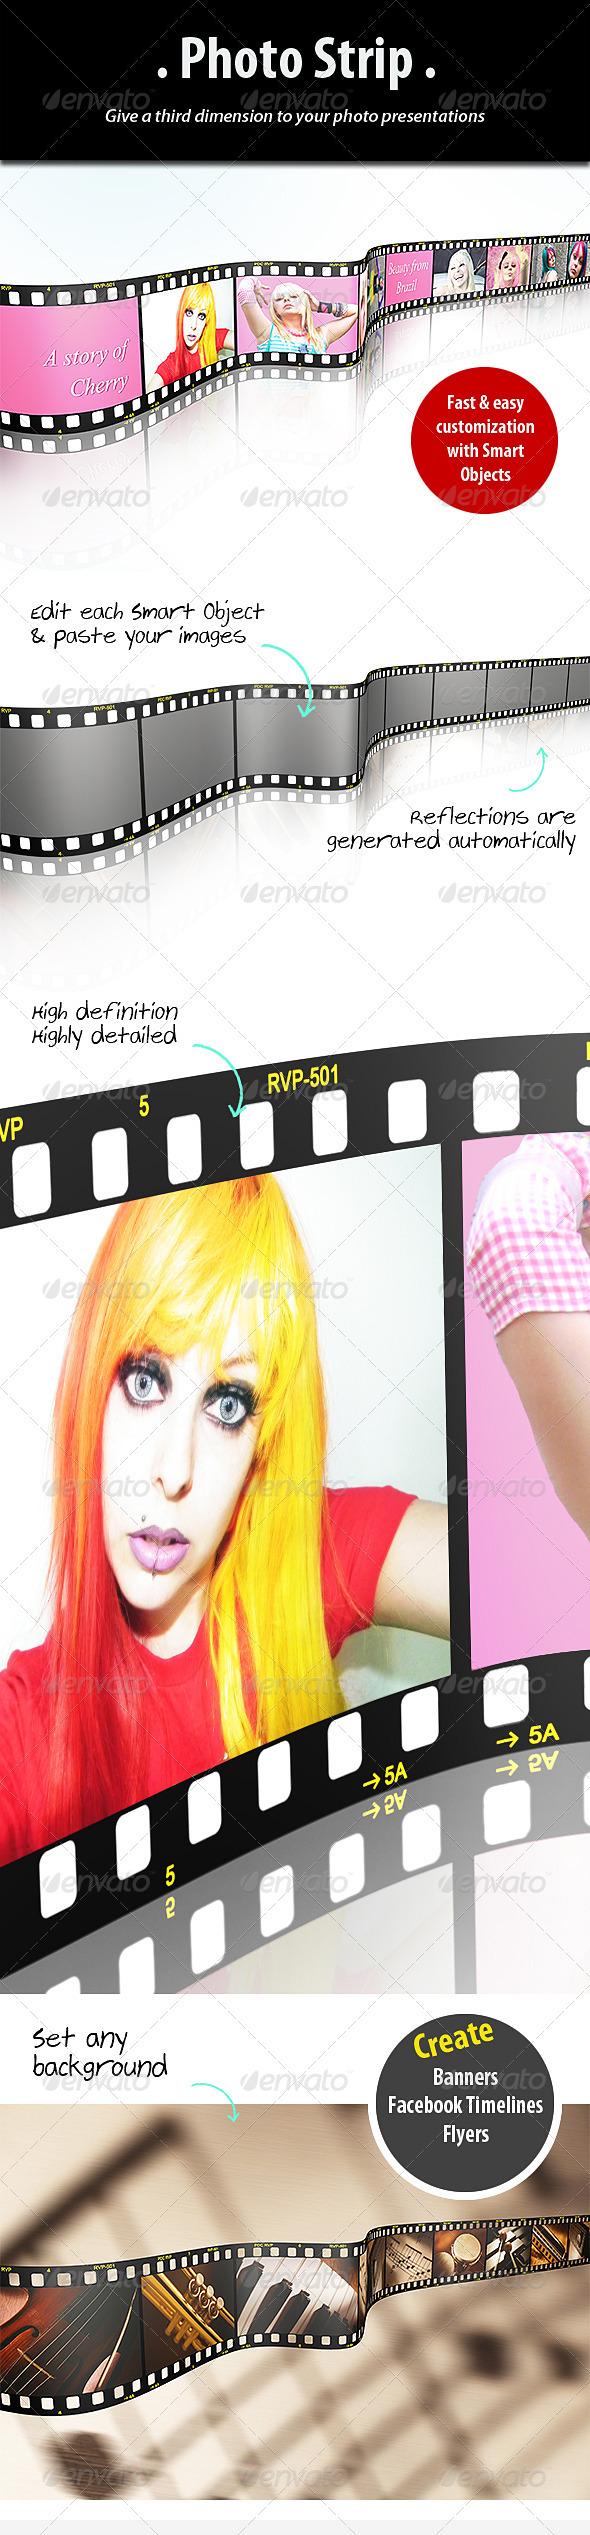 Photo Strip Template - Tech / Futuristic Photo Templates